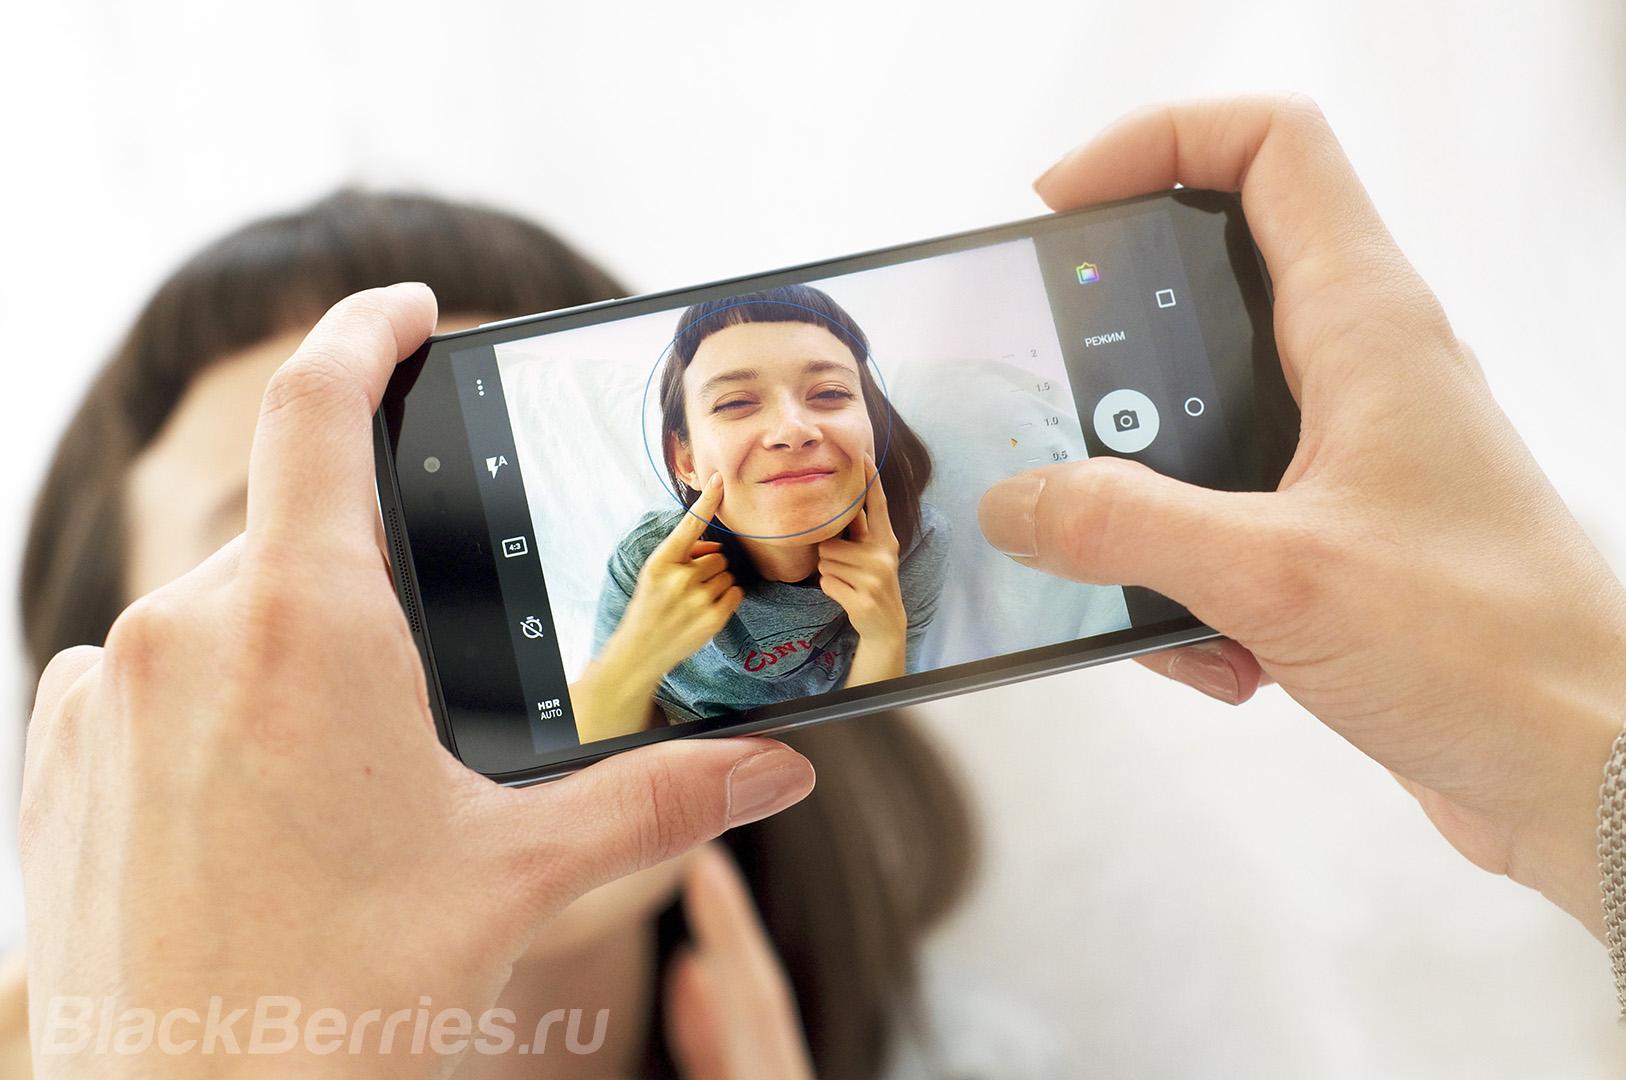 BlackBerry-DTEK50-review-17